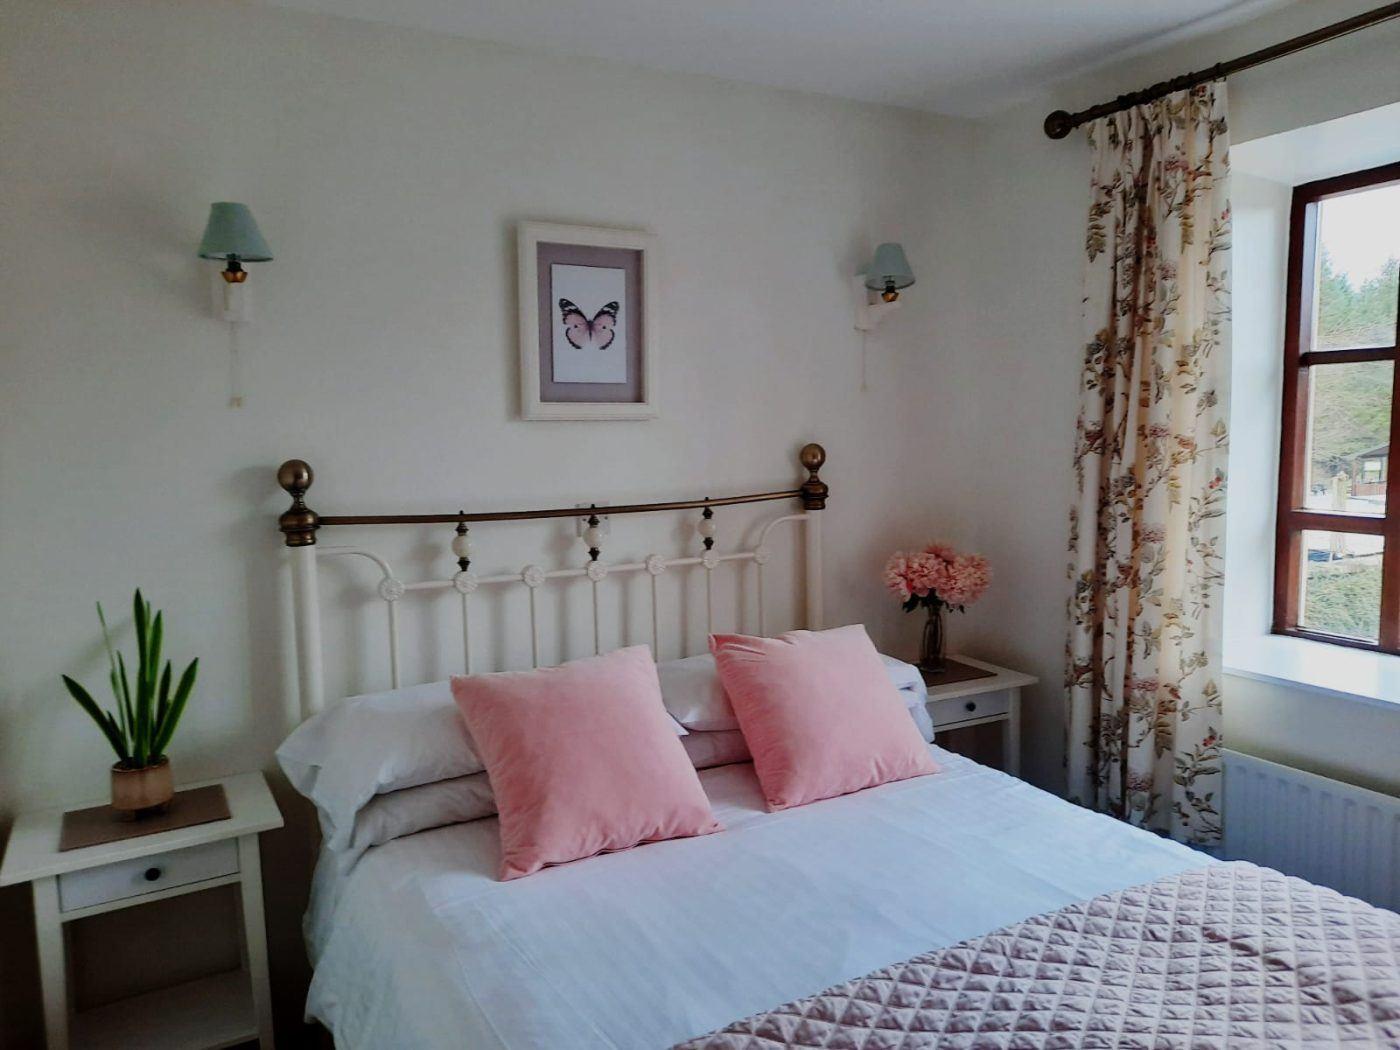 Bedroom in Laurel Self Catering Apartment at Blessingbourne Estate fivemiletown